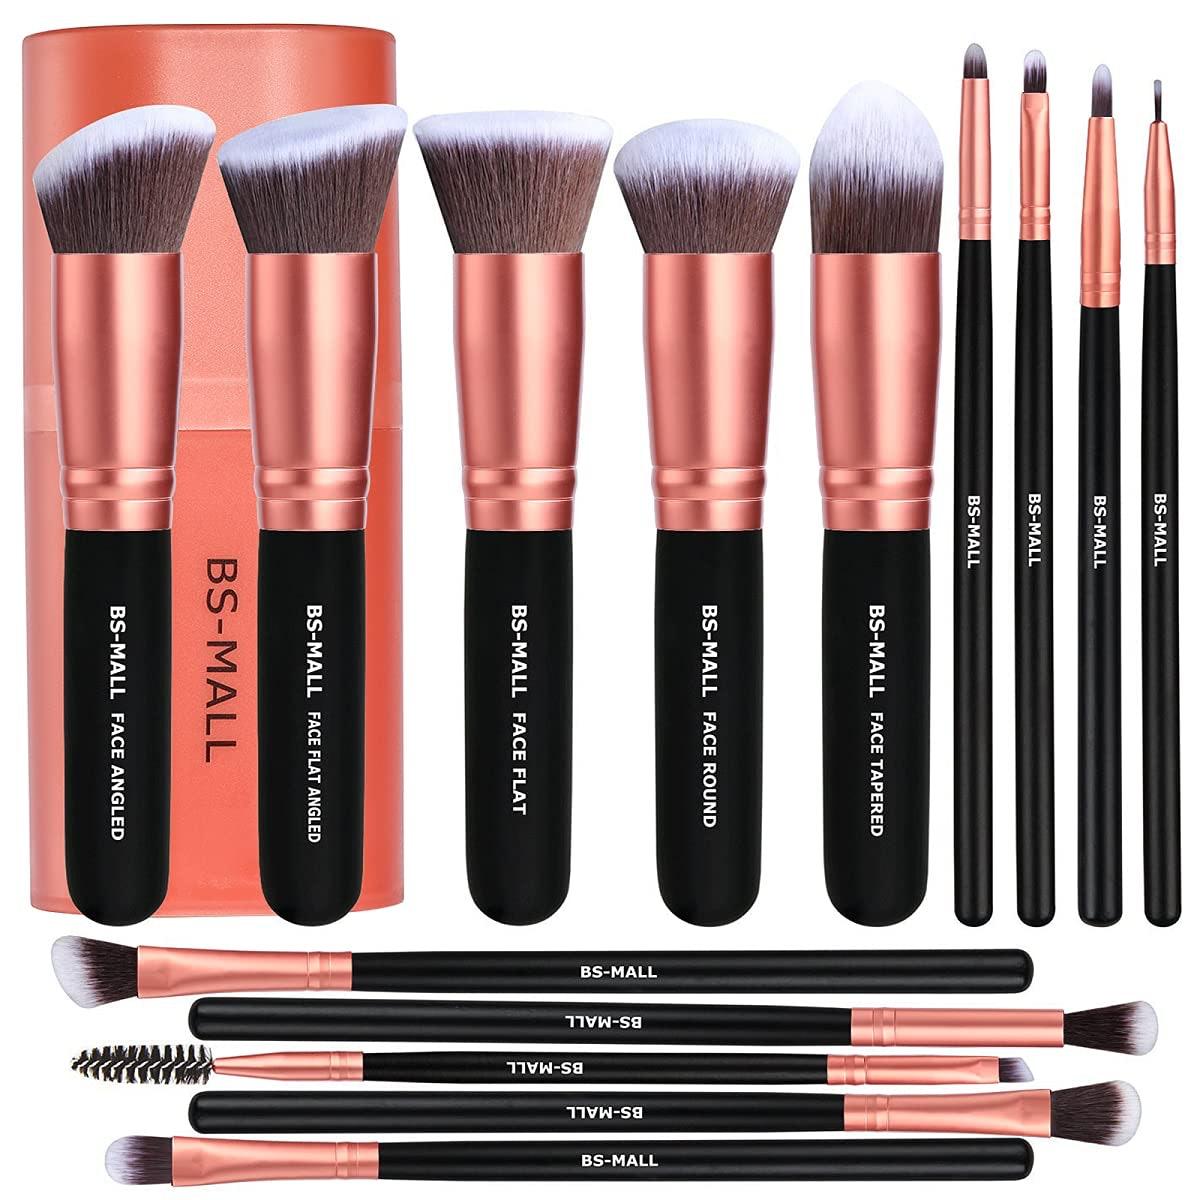 BS-MALL 14 Piece Makeup Brush Set